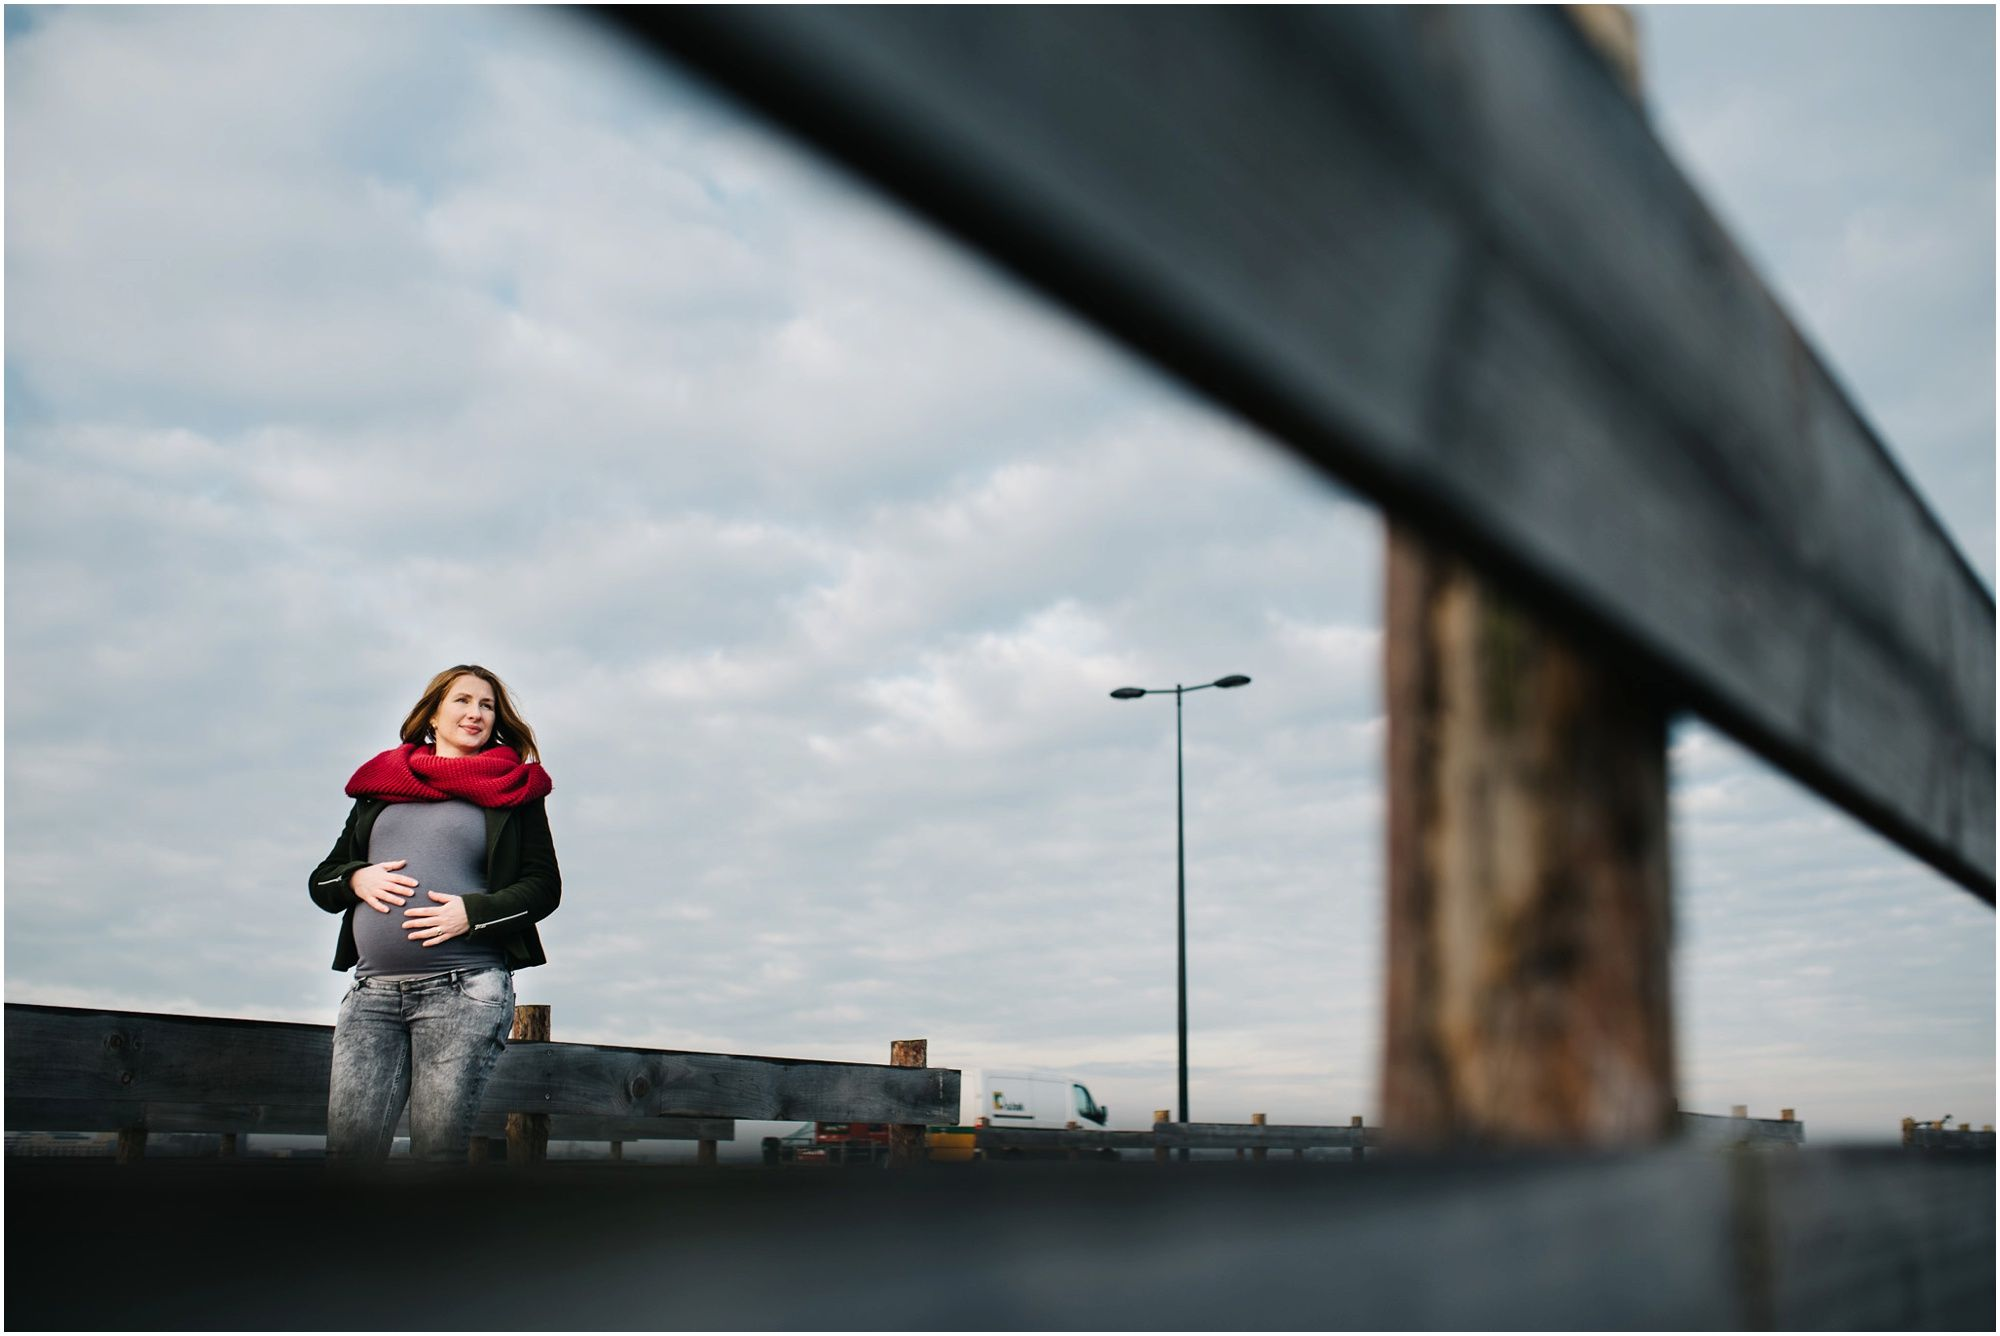 Stoere zwangerschapsfotografie Amsterdam fotoshoot zwangerschap zwangerschapsfoto's